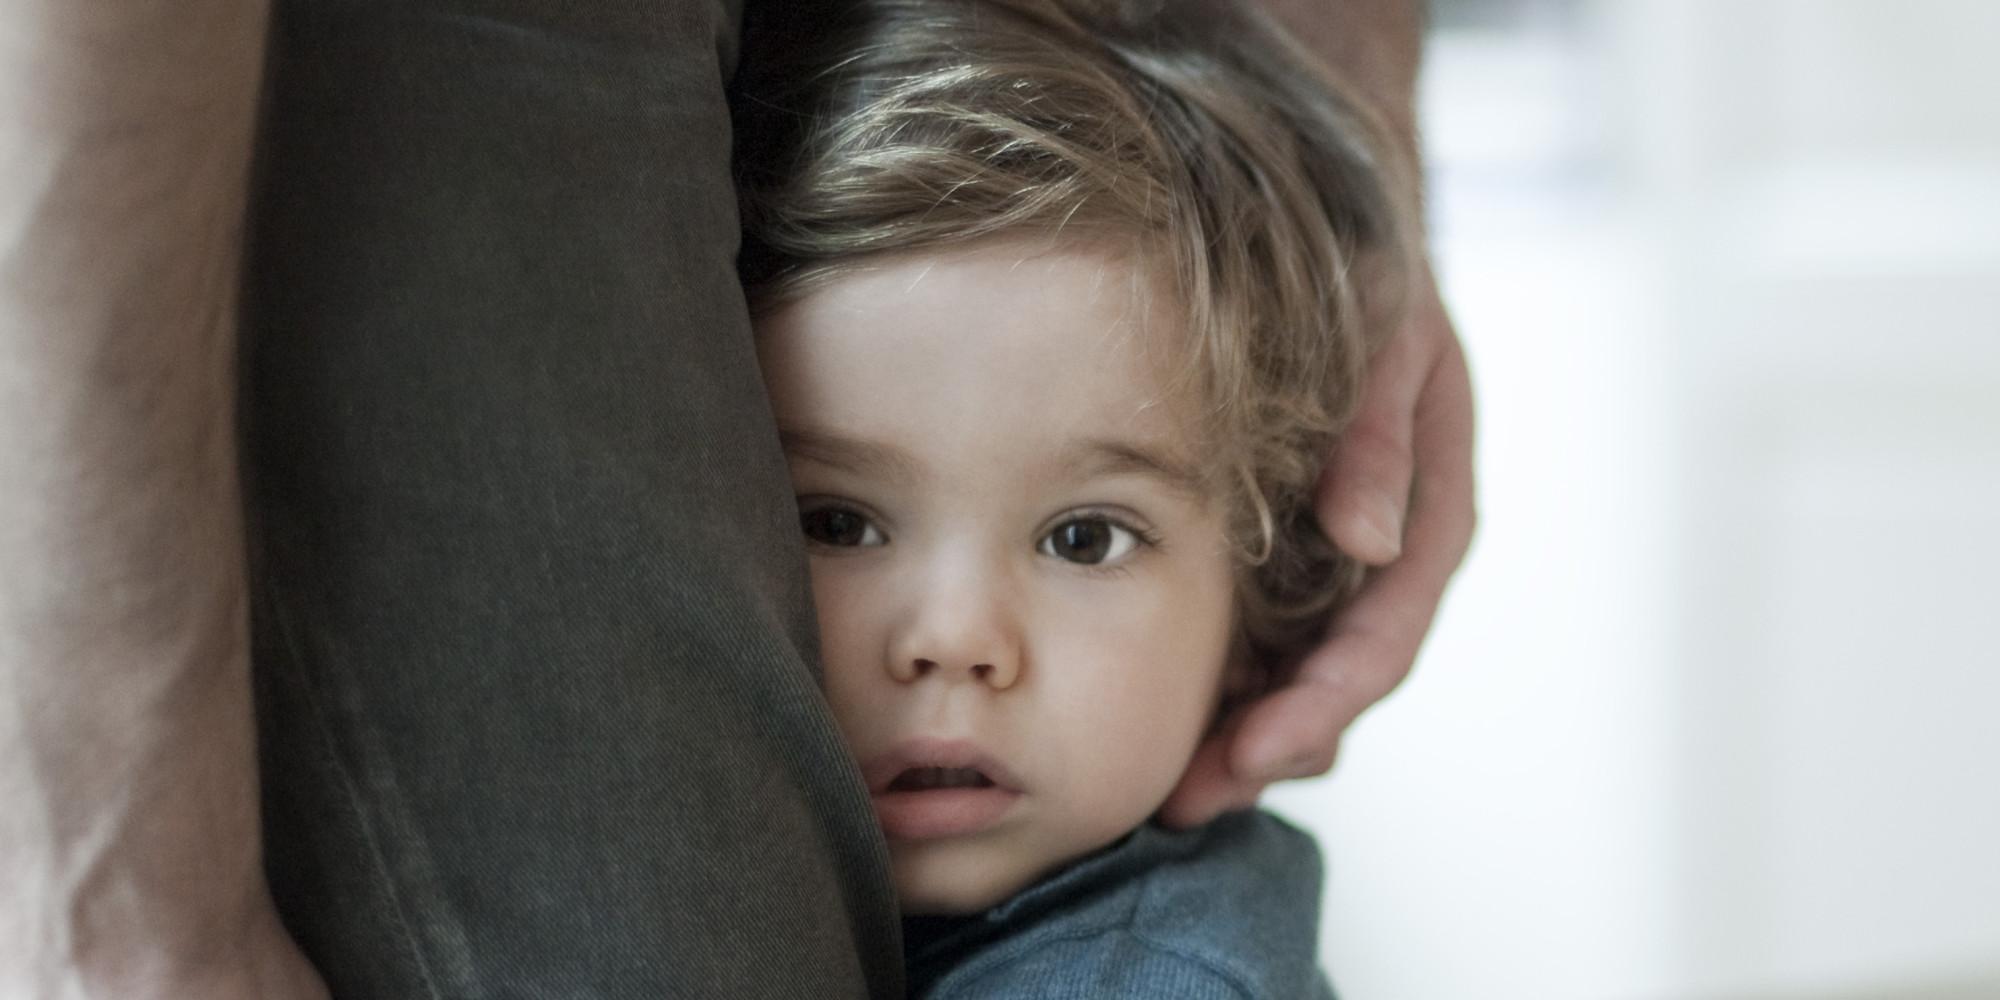 leis absurdas nova zelandia abuso sexual infantil